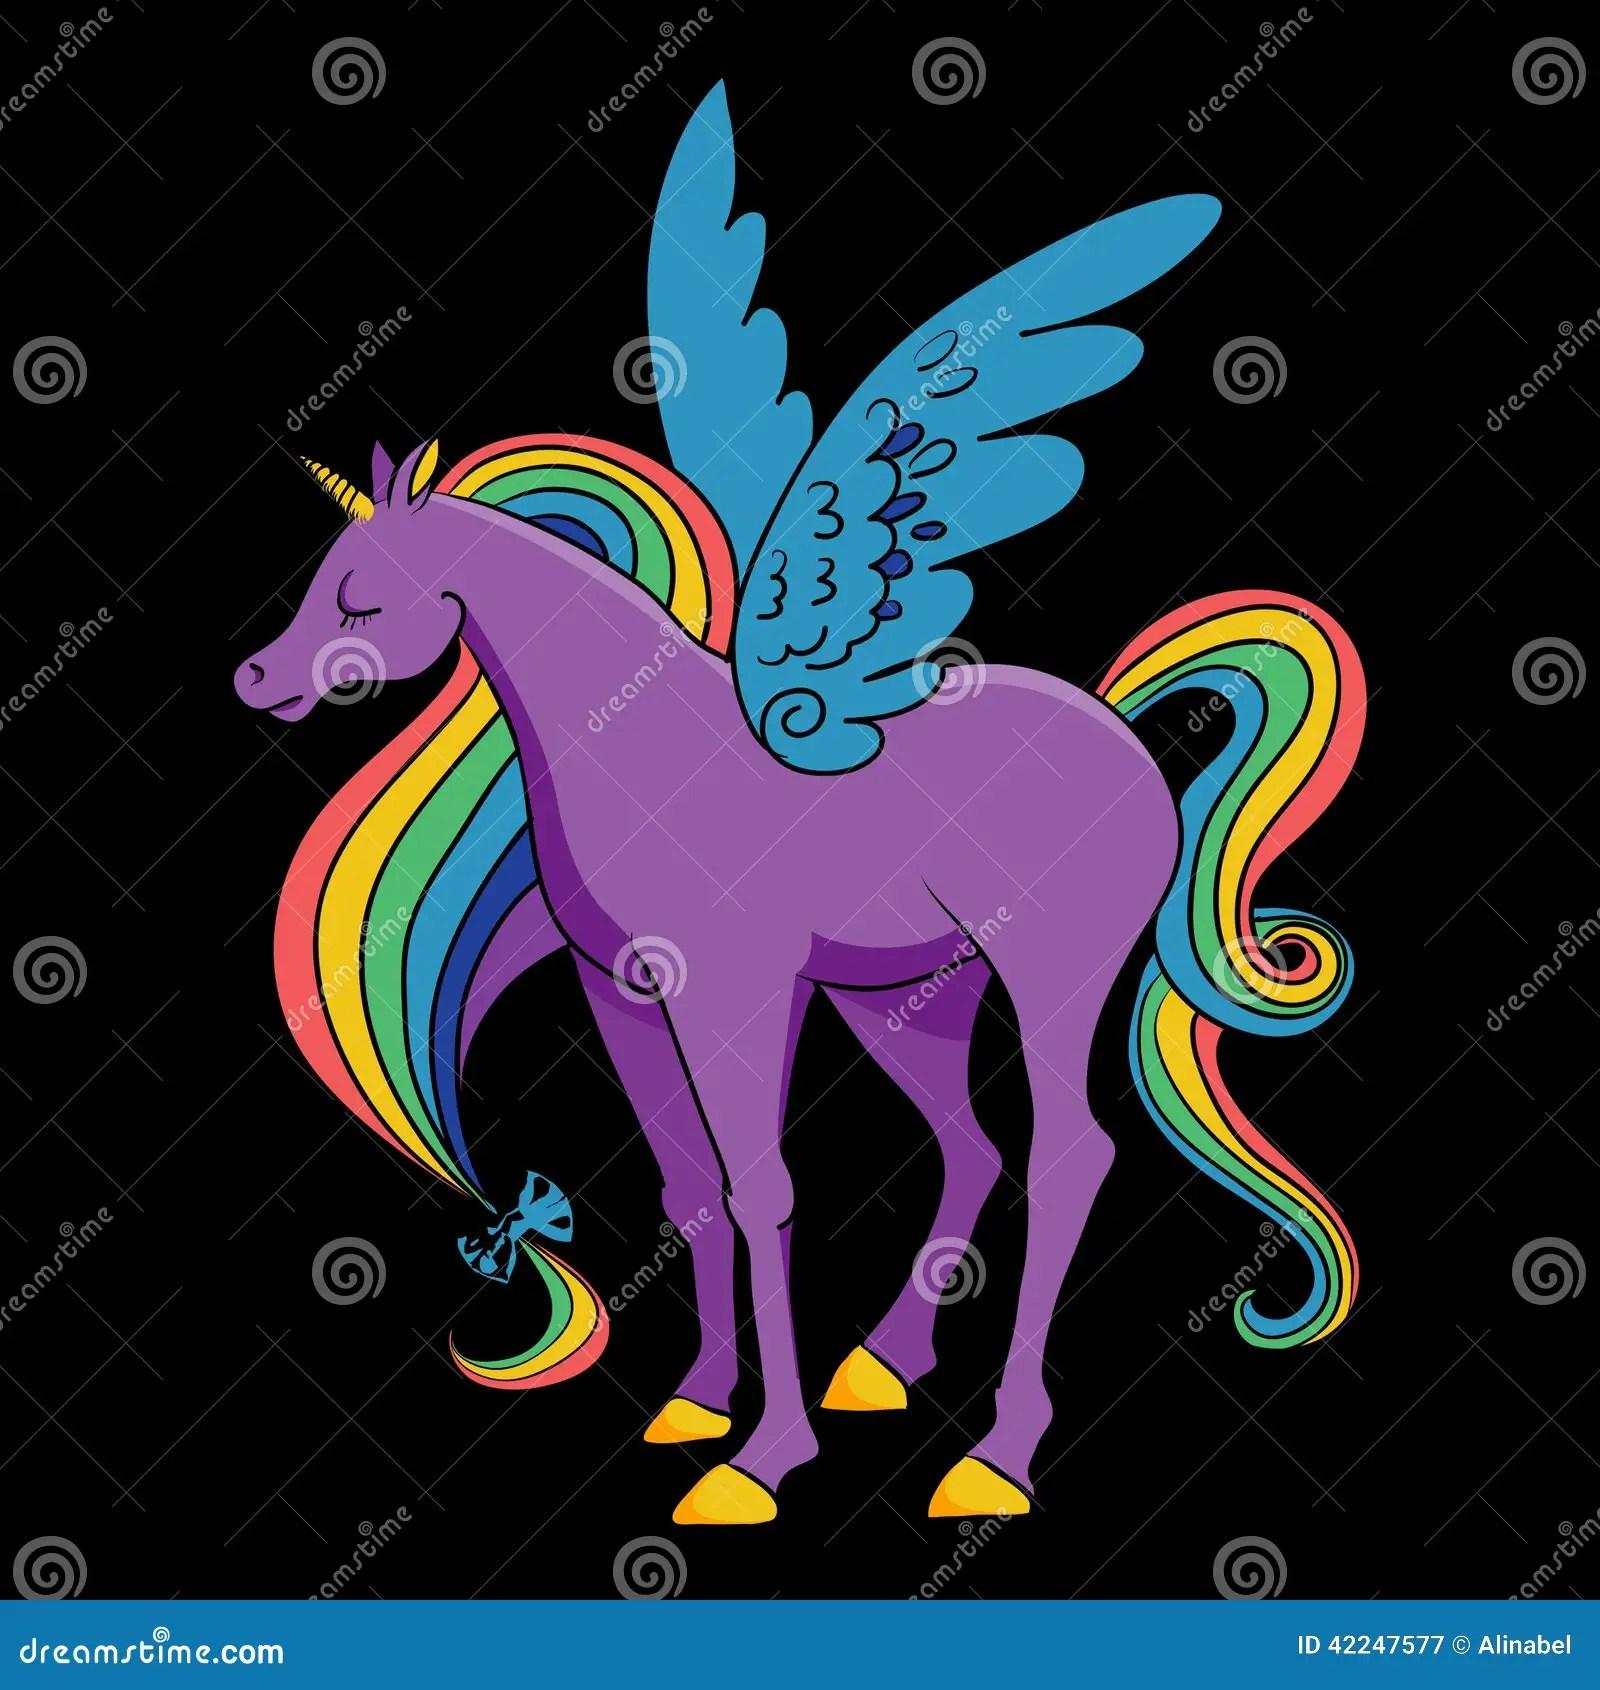 Cute Cartoon Horse Wallpaper Cartoon Rainbow Colored Unicorn Stock Vector Image 42247577